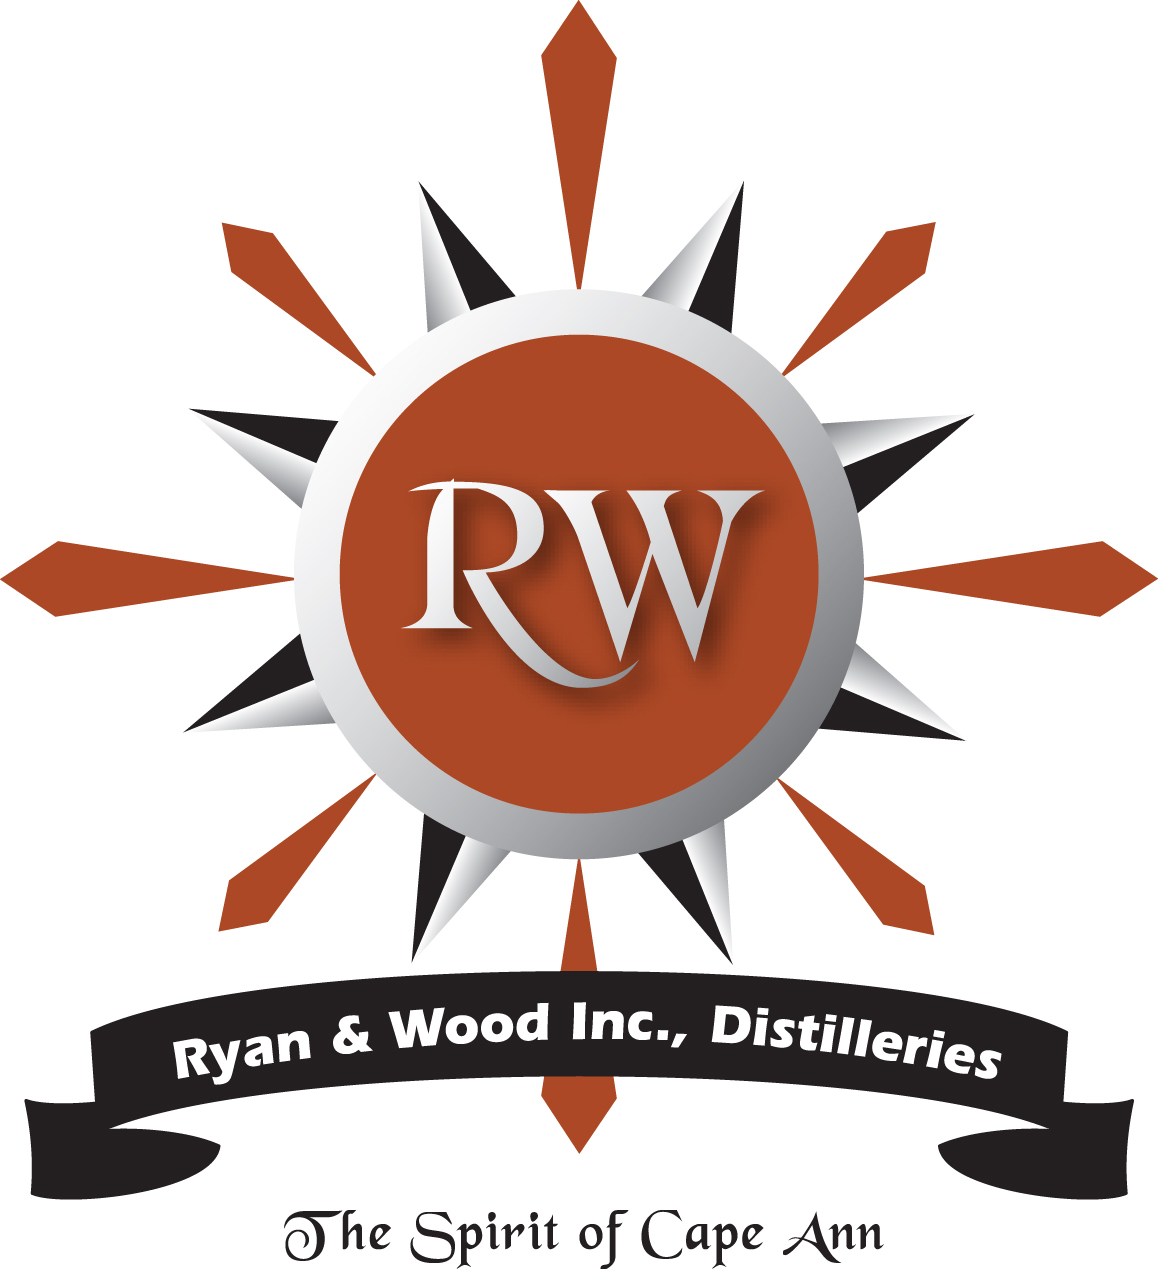 RW Full logo final flattened.jpg